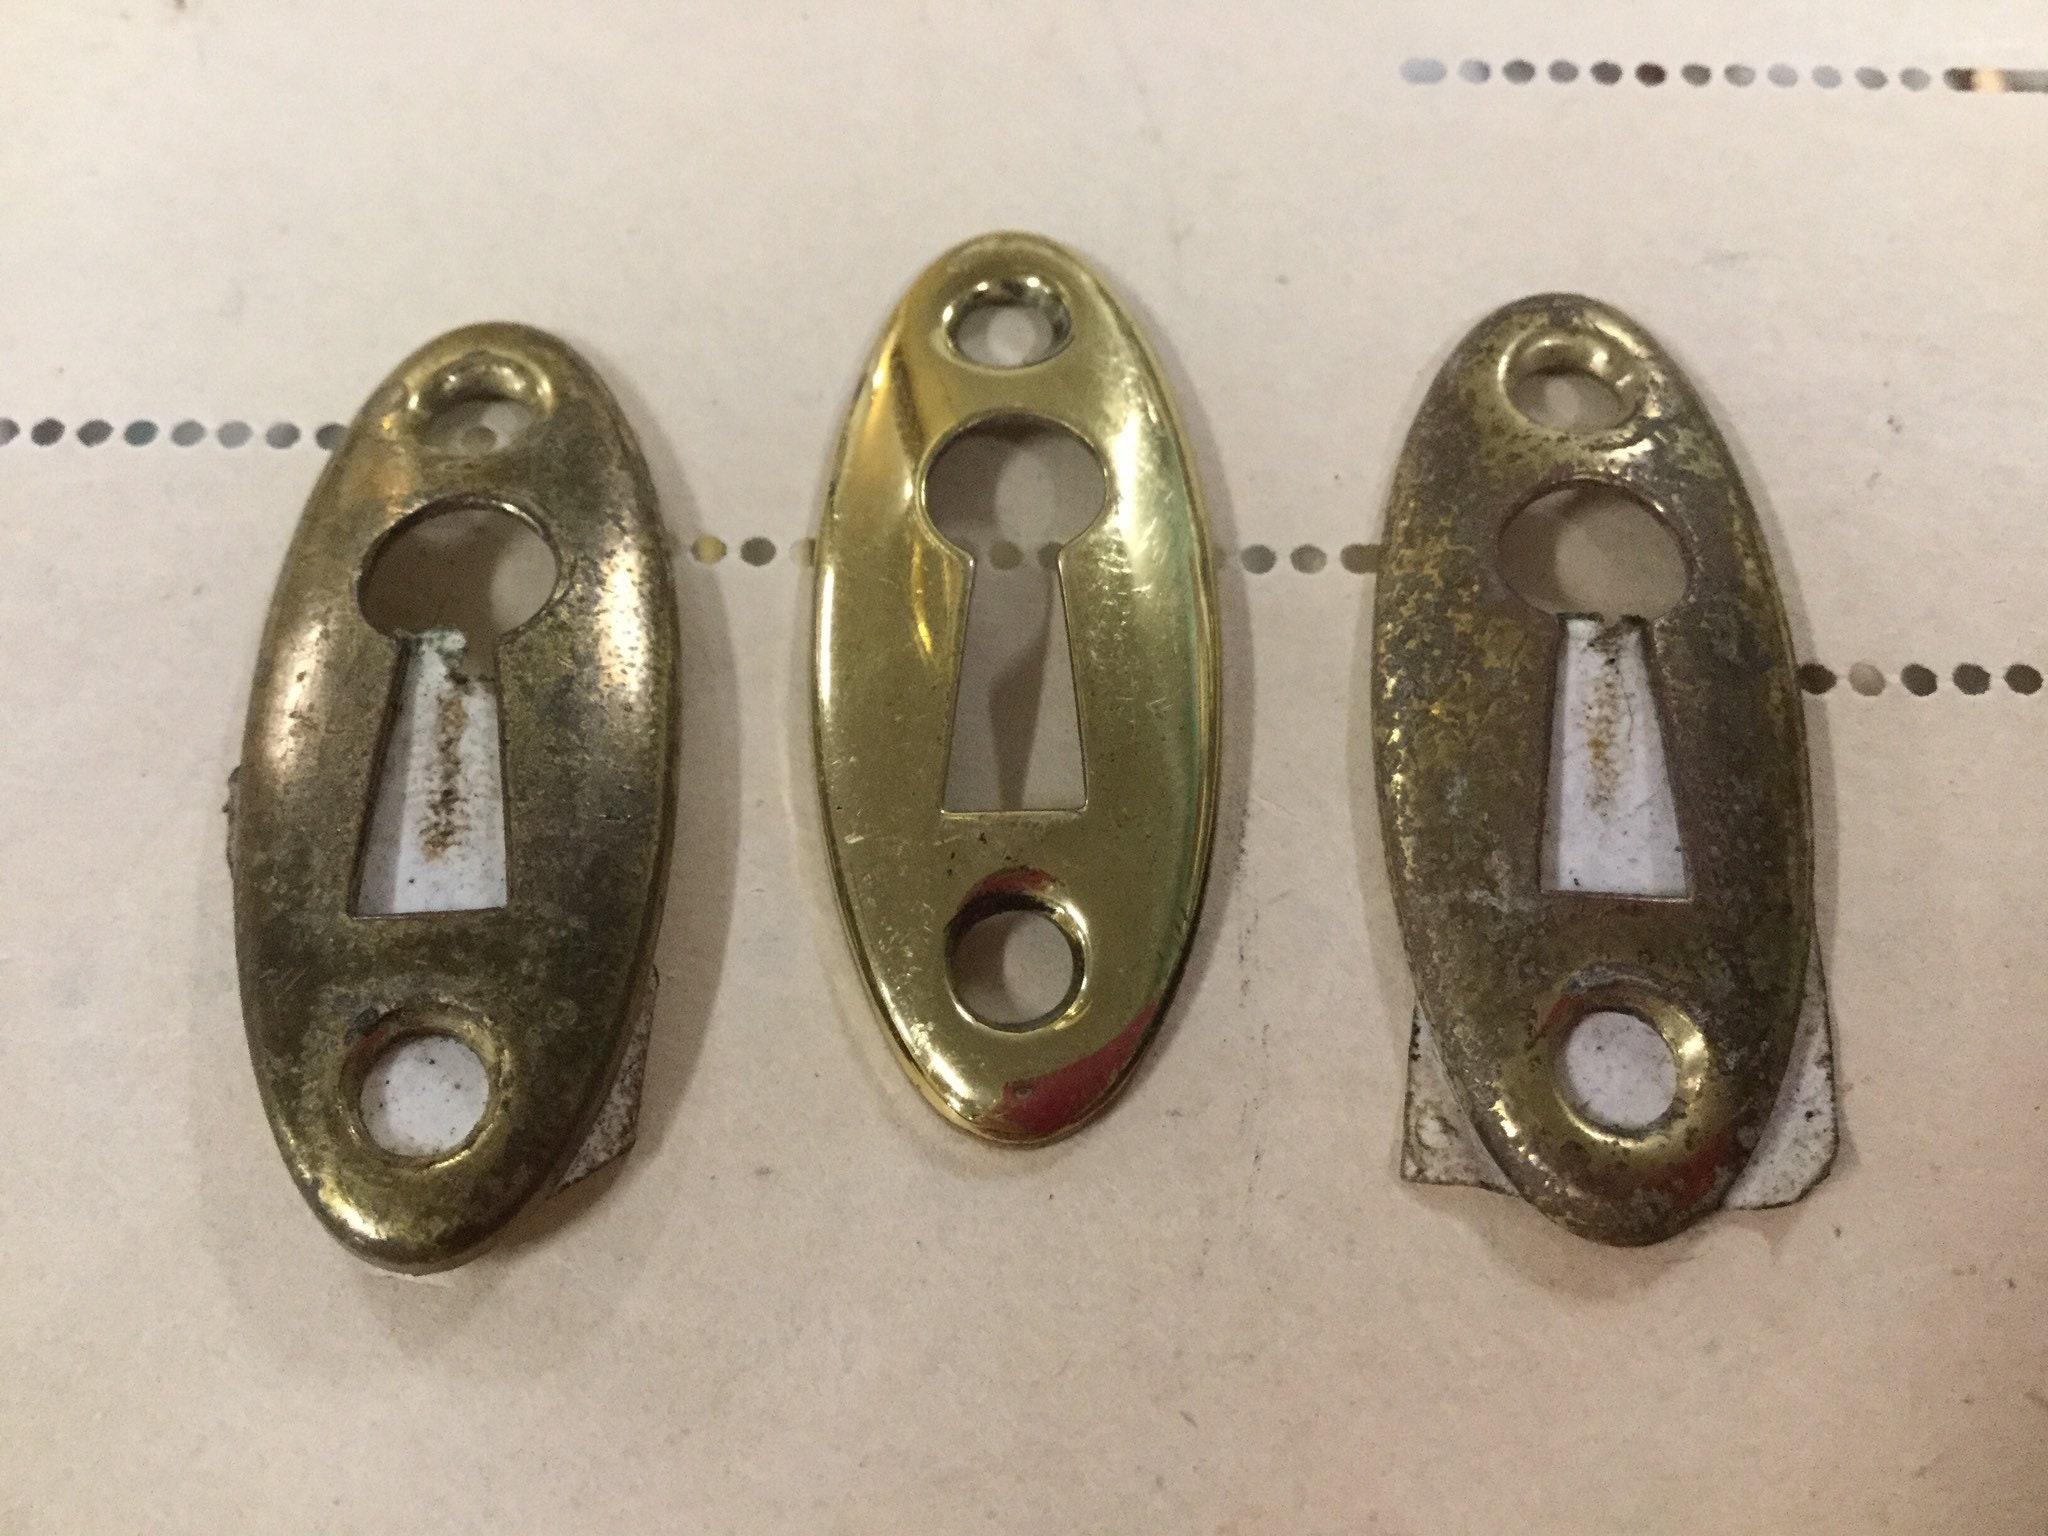 Antique Brass Skinny Oval Key Escutcheon